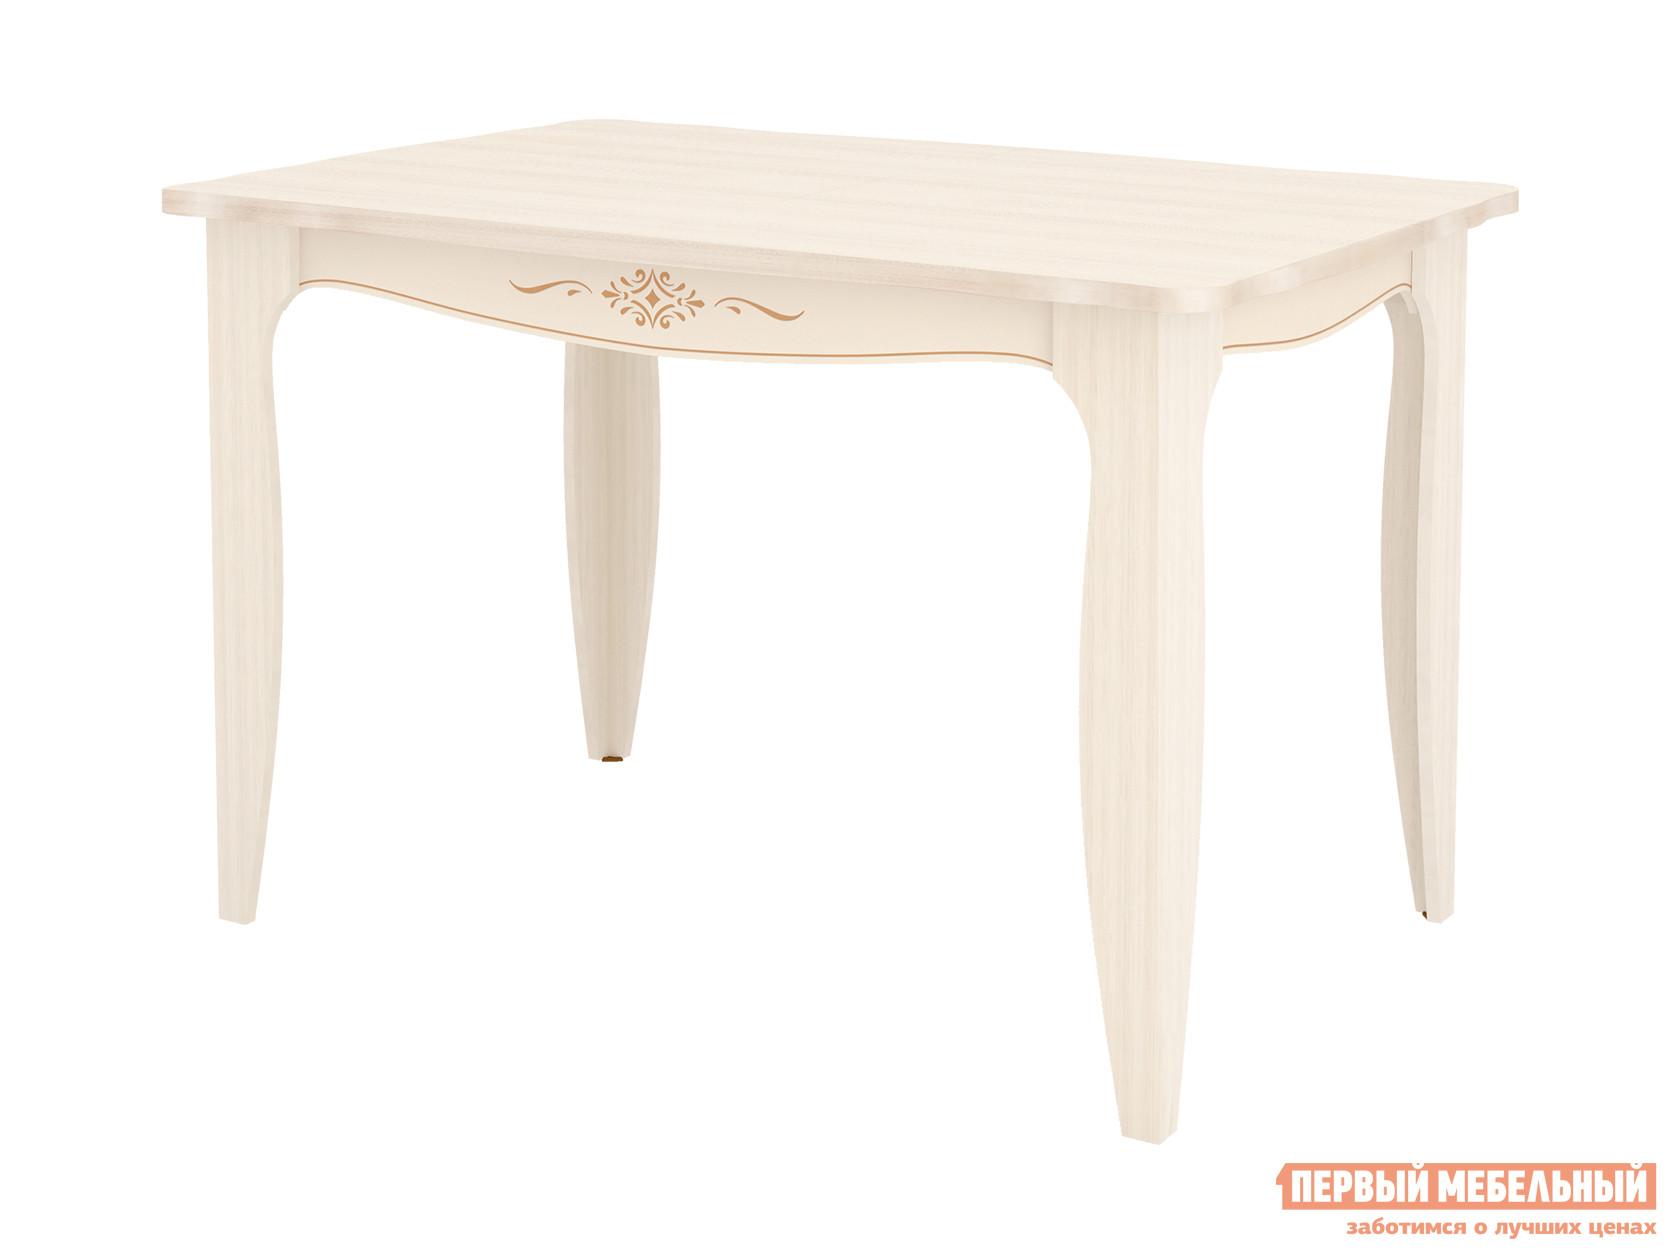 Обеденный стол Витра Орфей-32.10 обеденный стол трансформер витра орфей 16 1